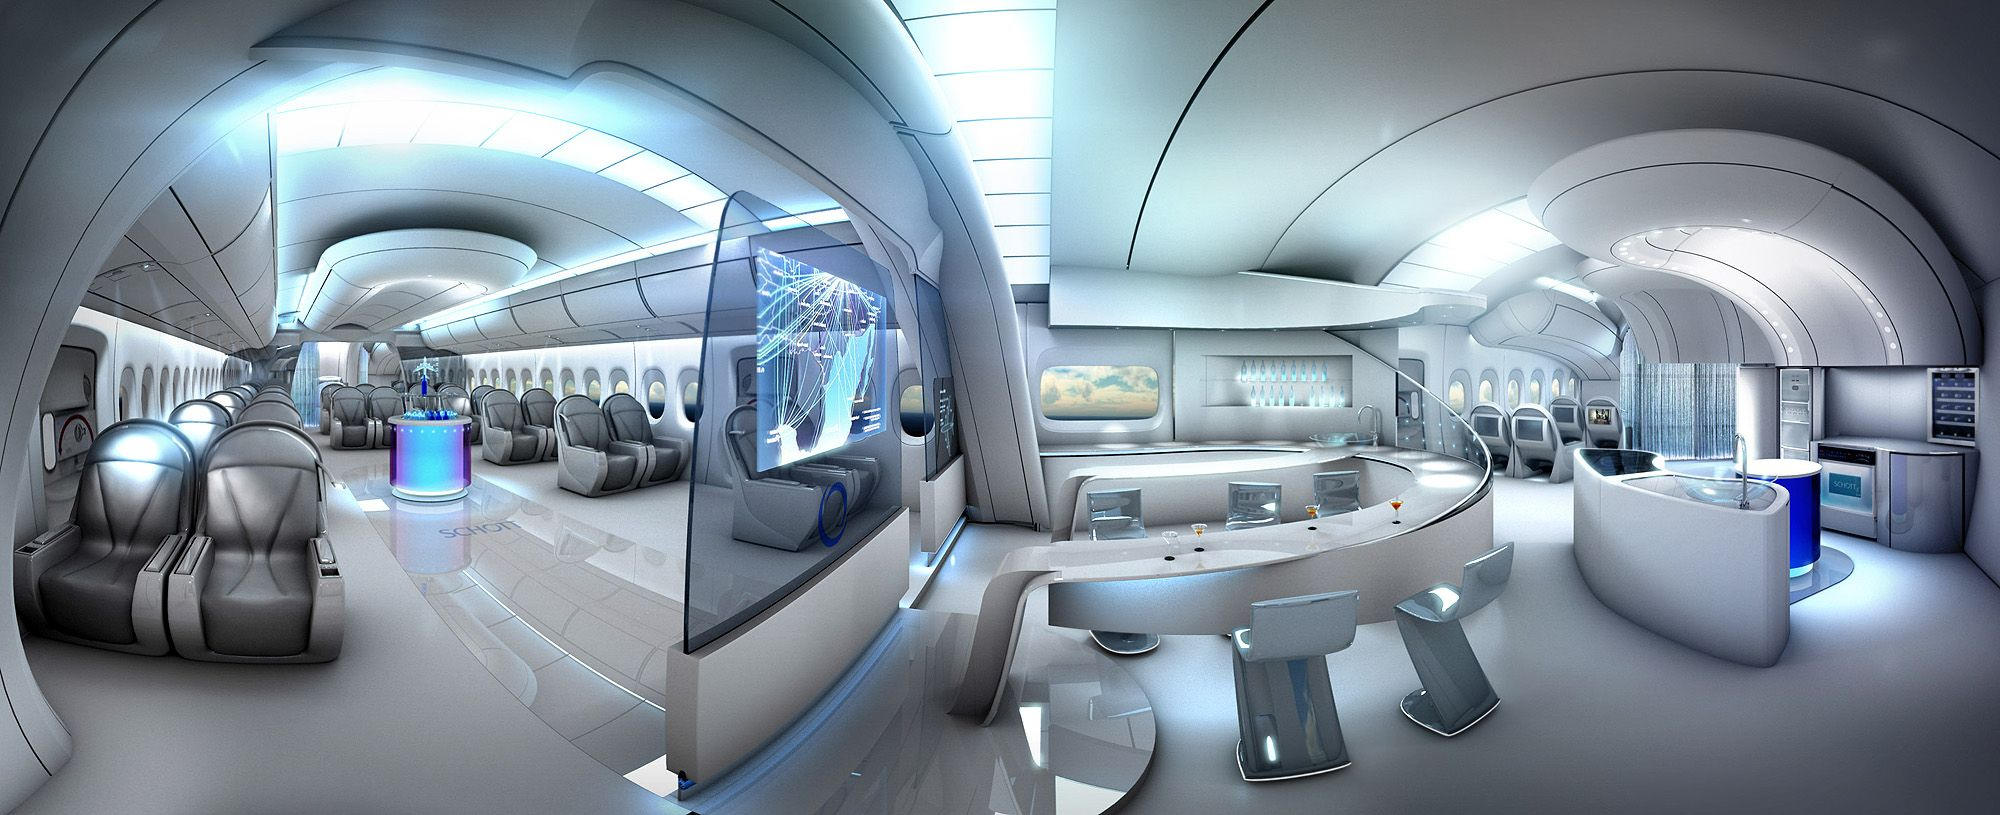 Aviation, Airplane Interior